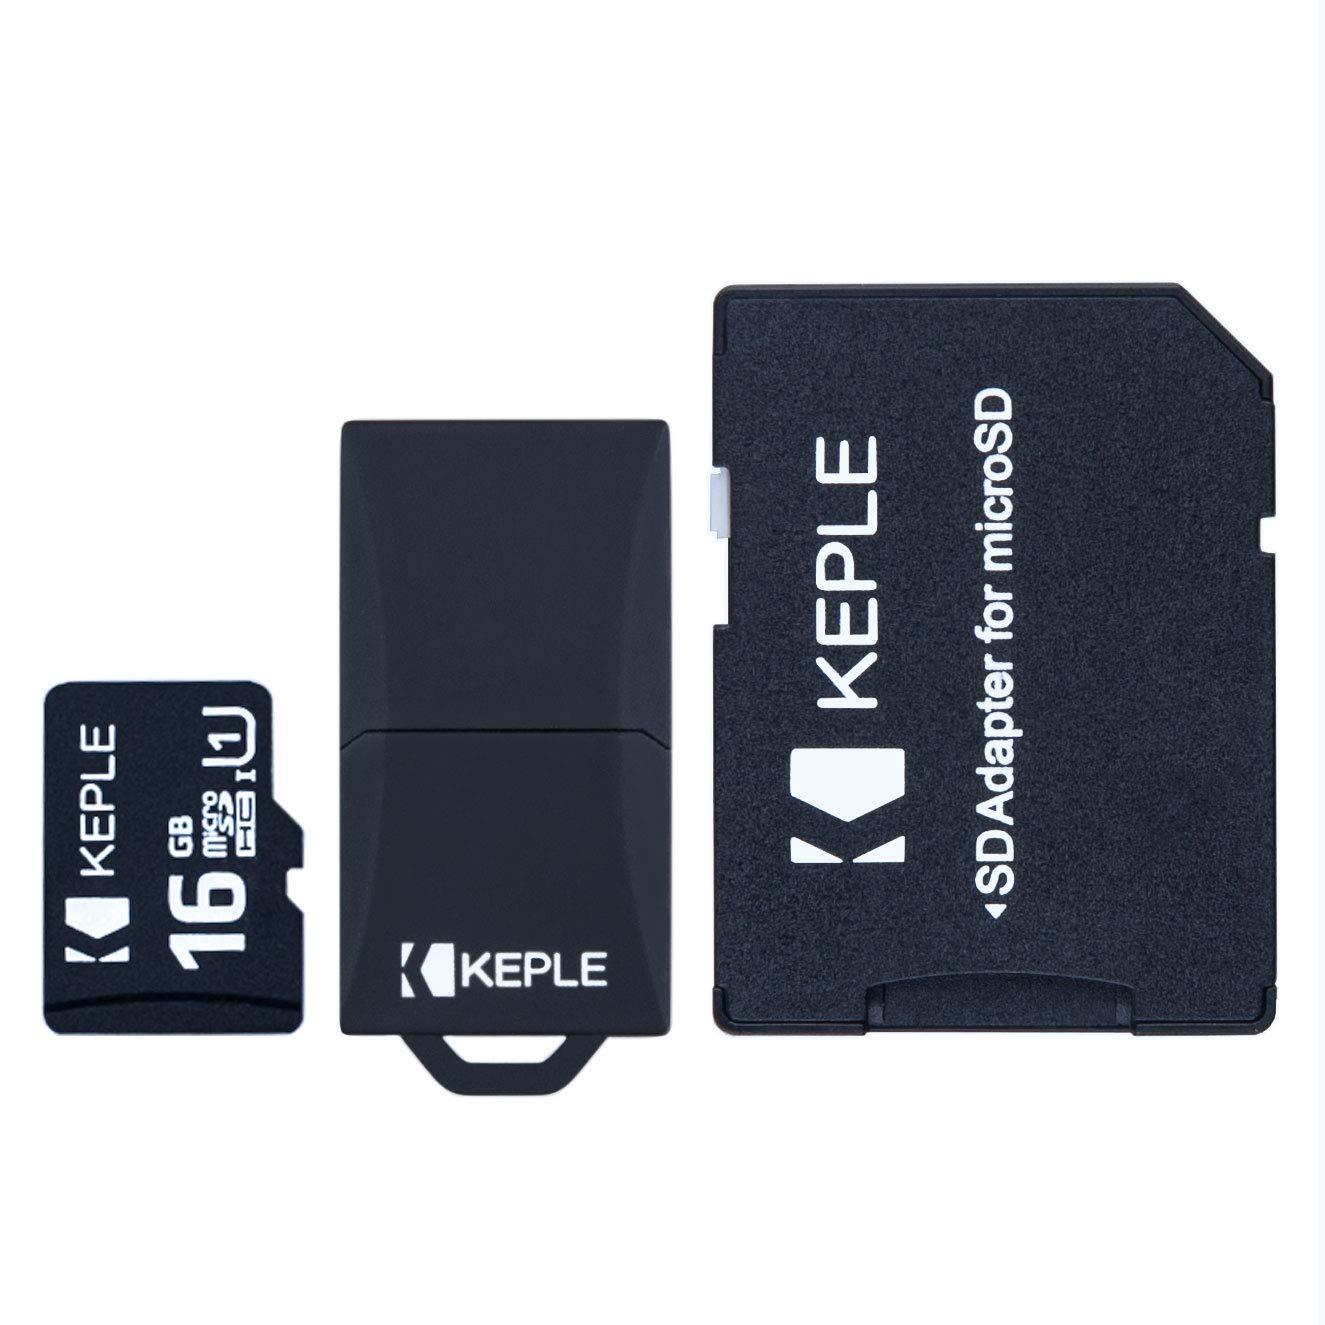 HDR-CX280E original vhbw® Dual Ladegerät für SONY Handycam HDR-CX220E